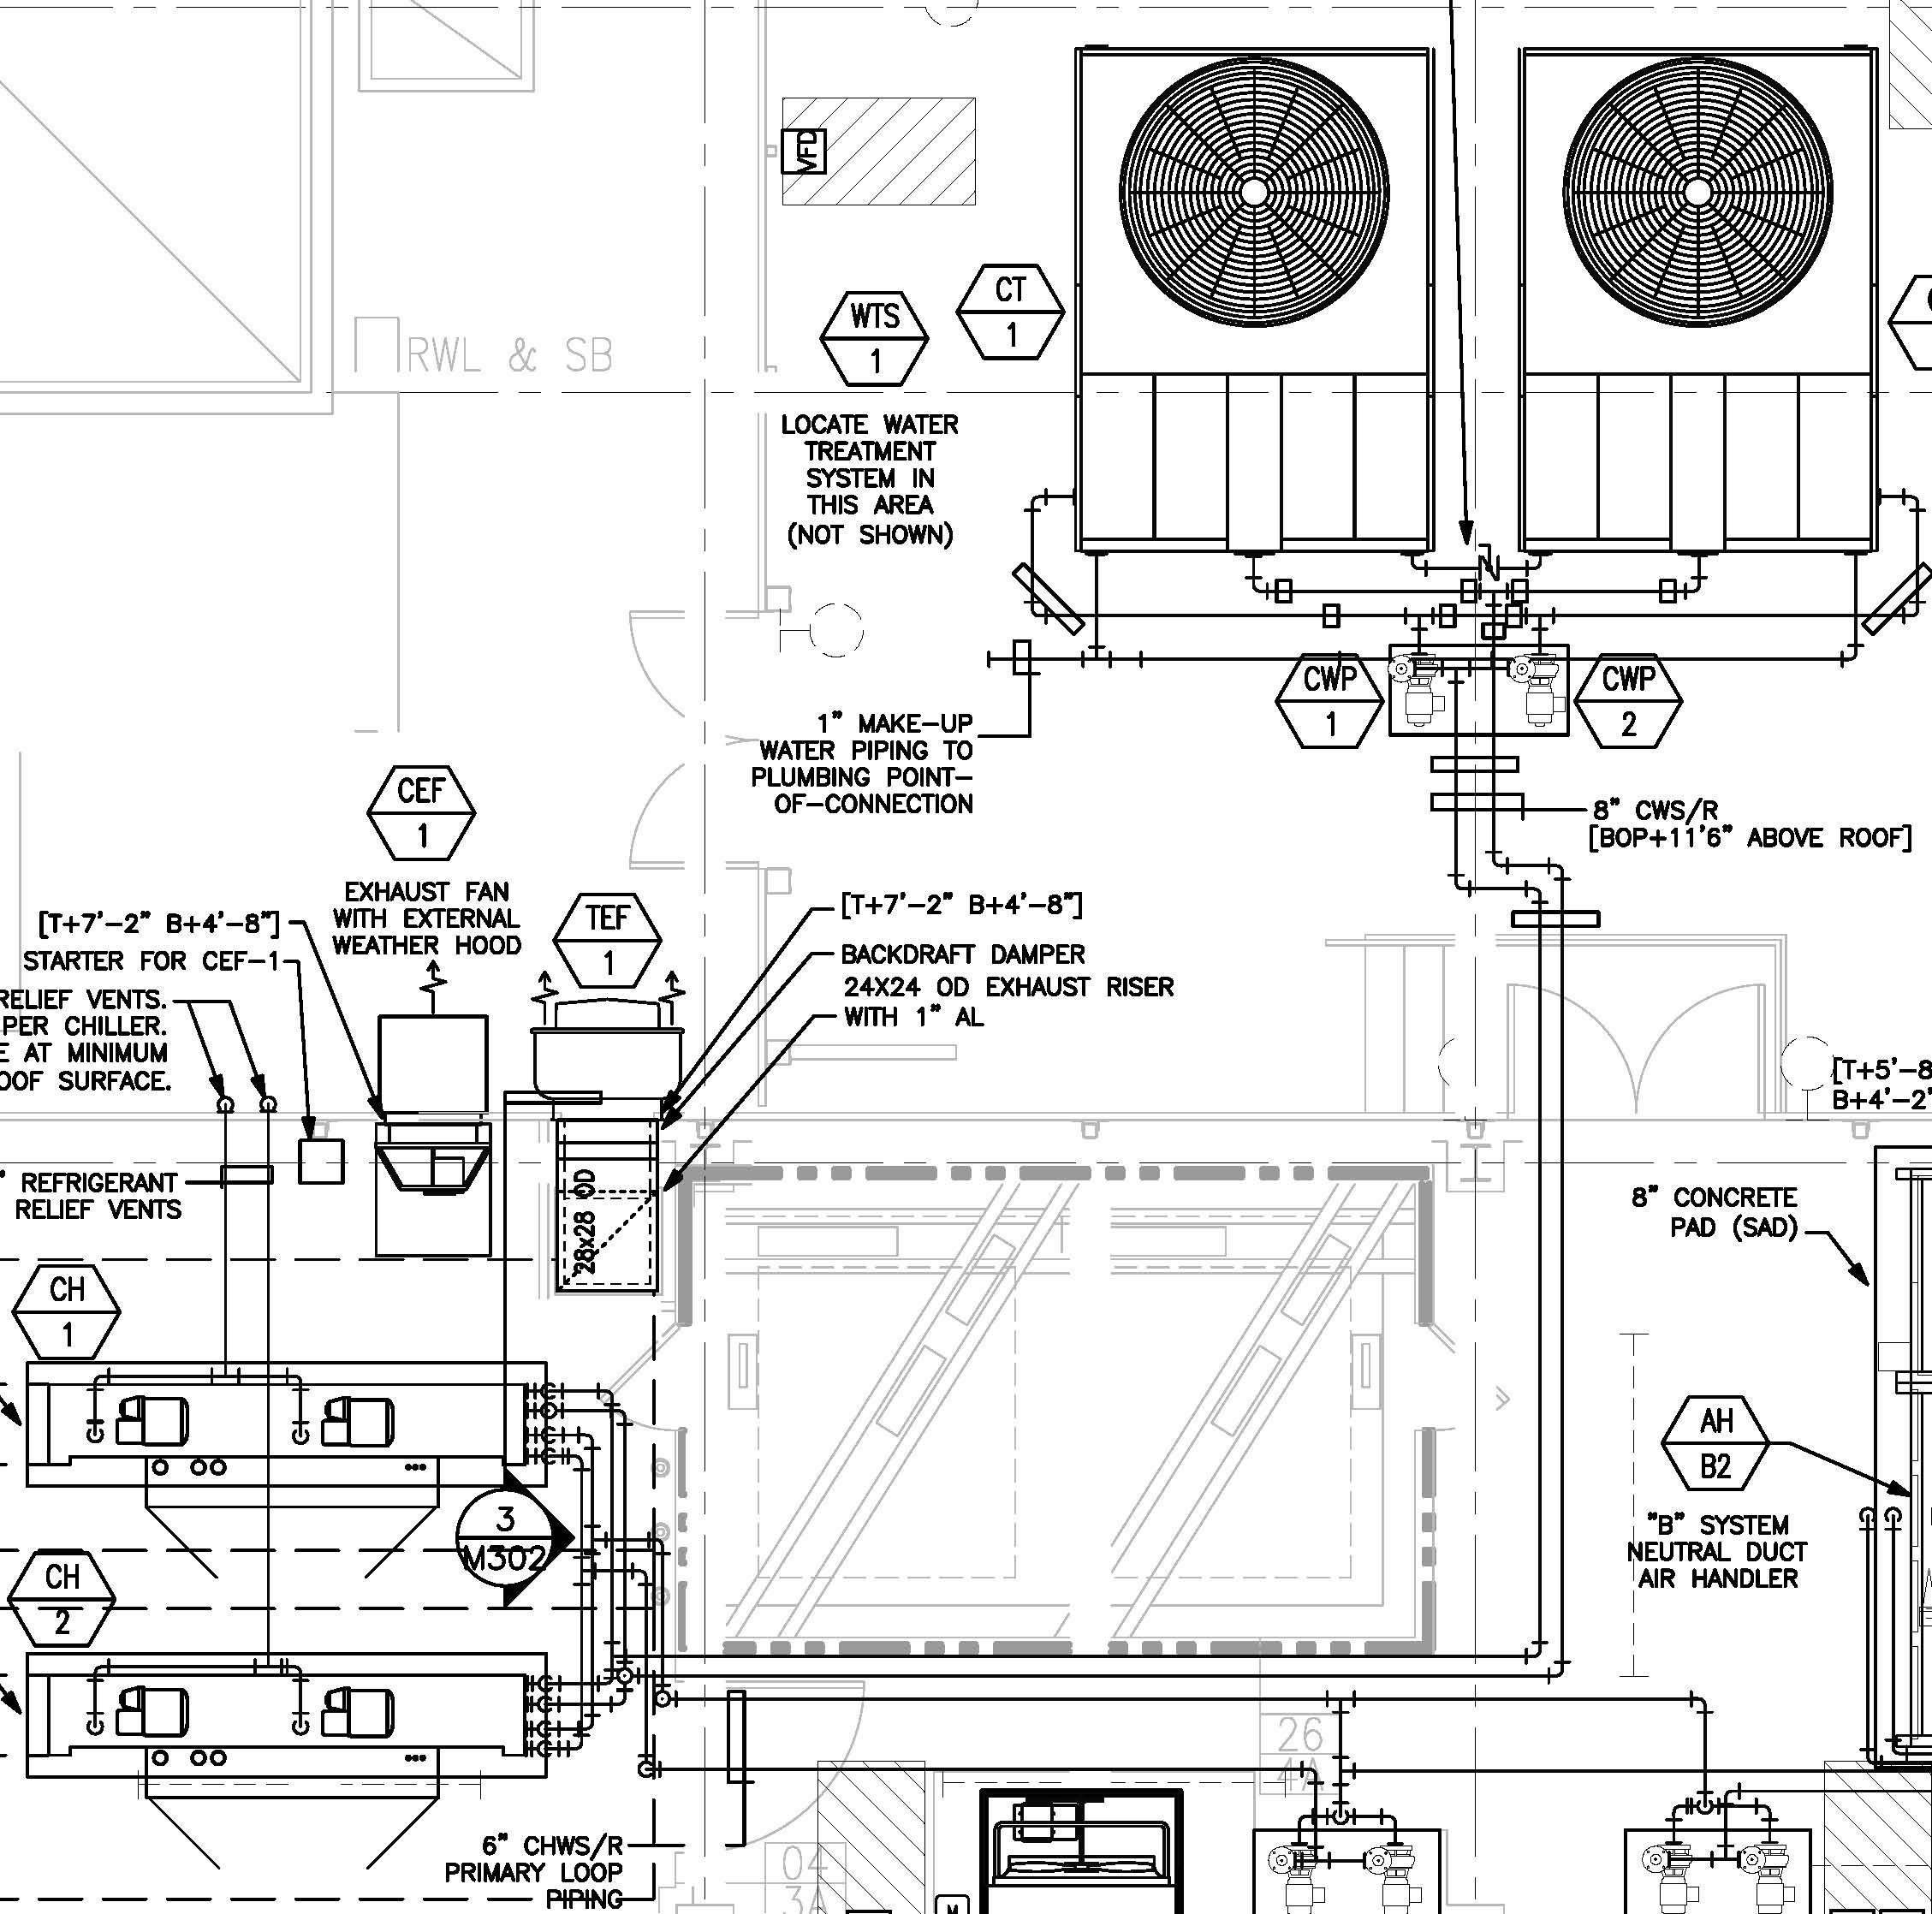 Toyota Power Window Switch Wiring Diagram Hvac Lockout Relay Wiring Diagram Worksheet and Wiring Diagram • Of Toyota Power Window Switch Wiring Diagram